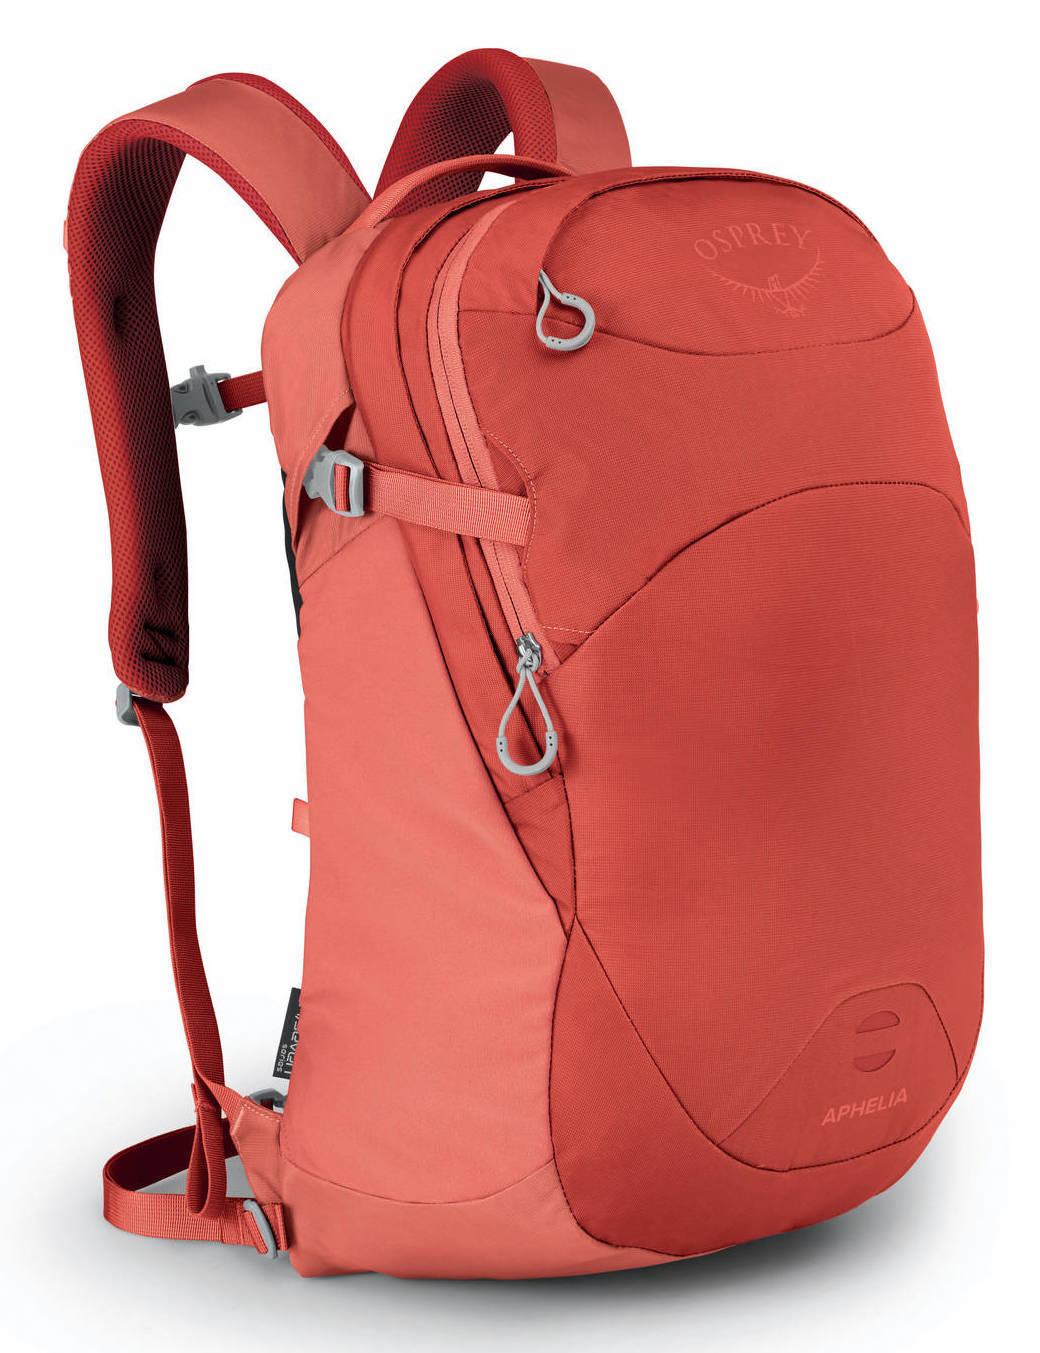 Городские рюкзаки Рюкзак Osprey Aphelia 26 Salmon Pink Aphelia_F20_Side_Salmon_Pink_web.jpg